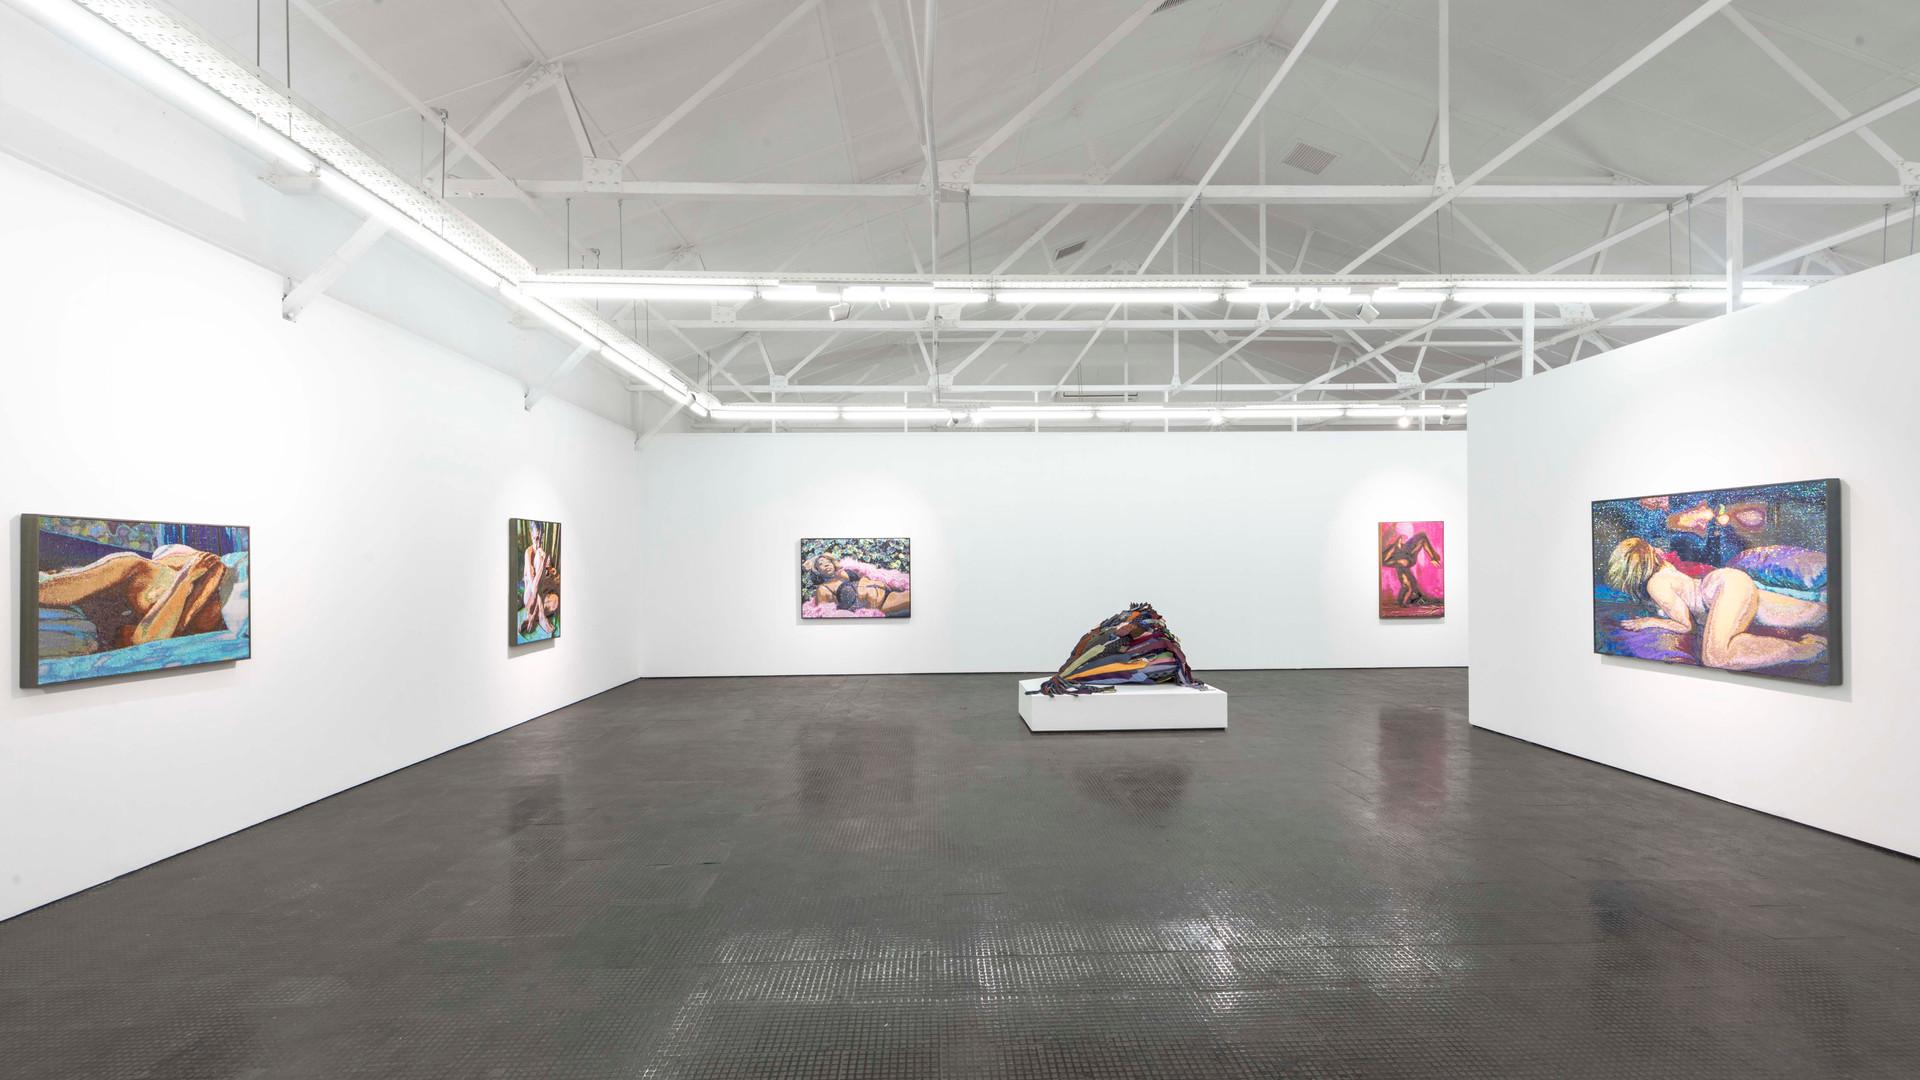 Frances Goodman | Uneventful Days | 2020 | Installation View